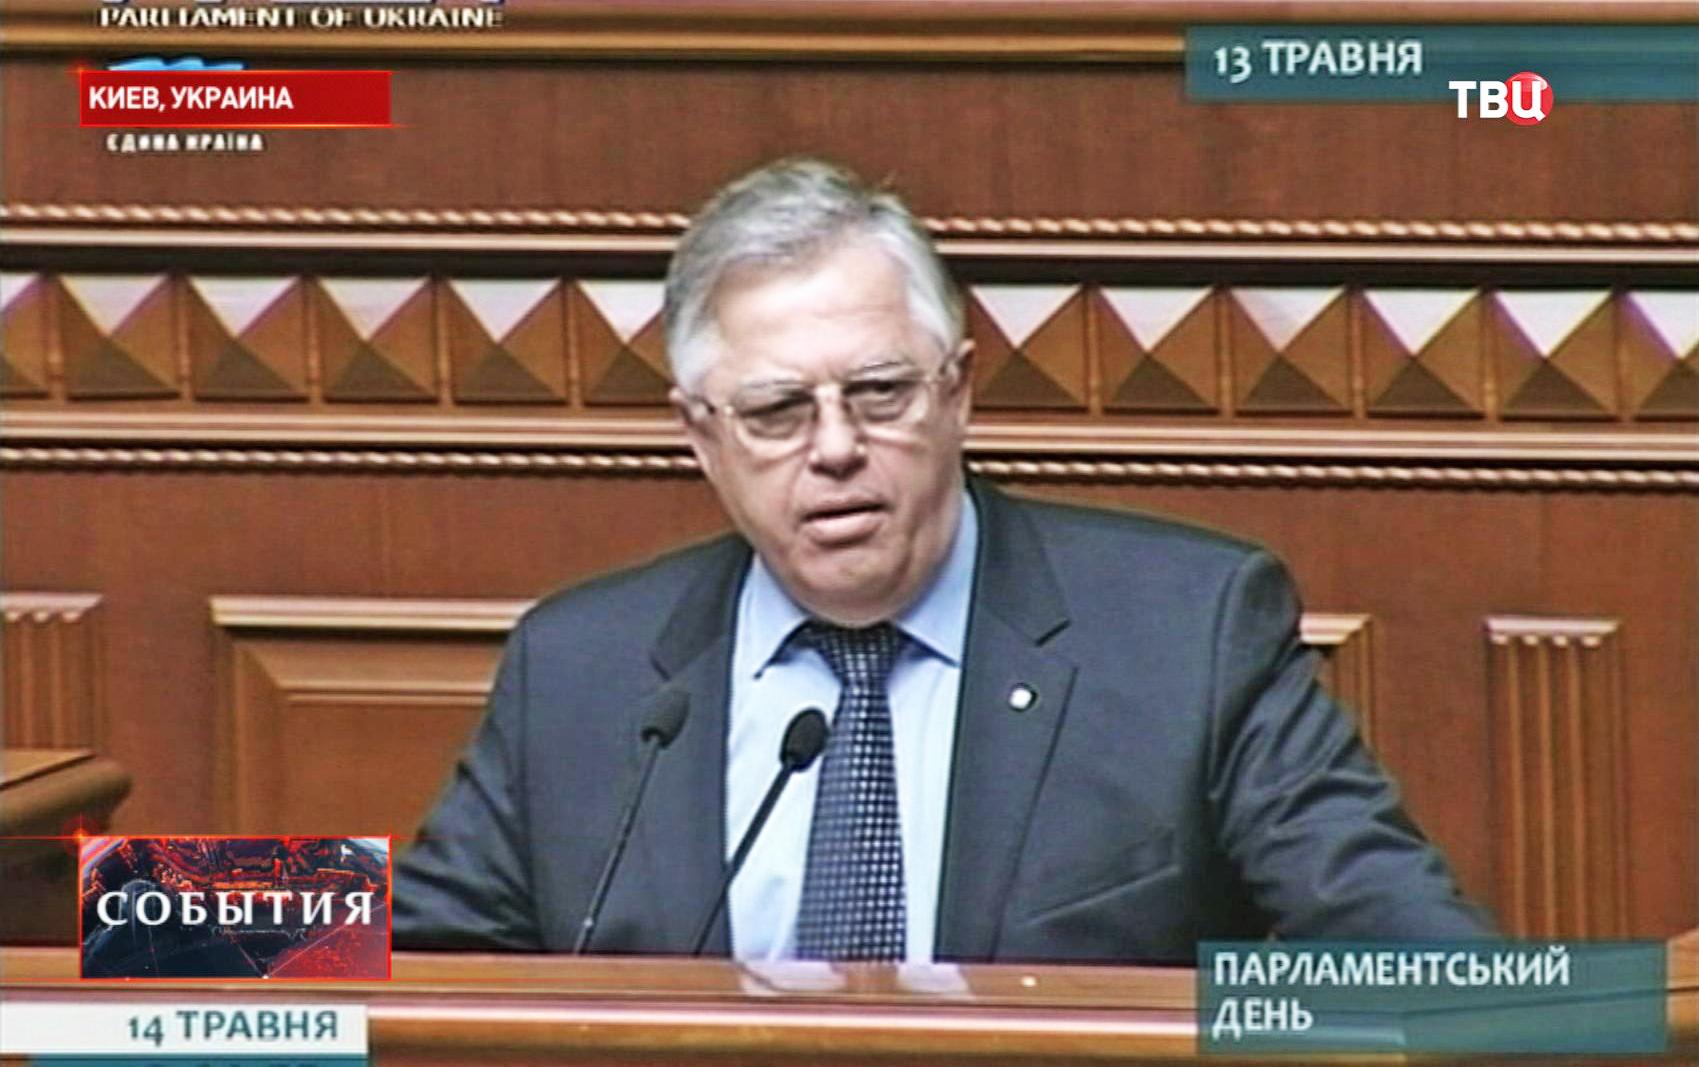 Лидер Компартии Украины  Петр Симоненко